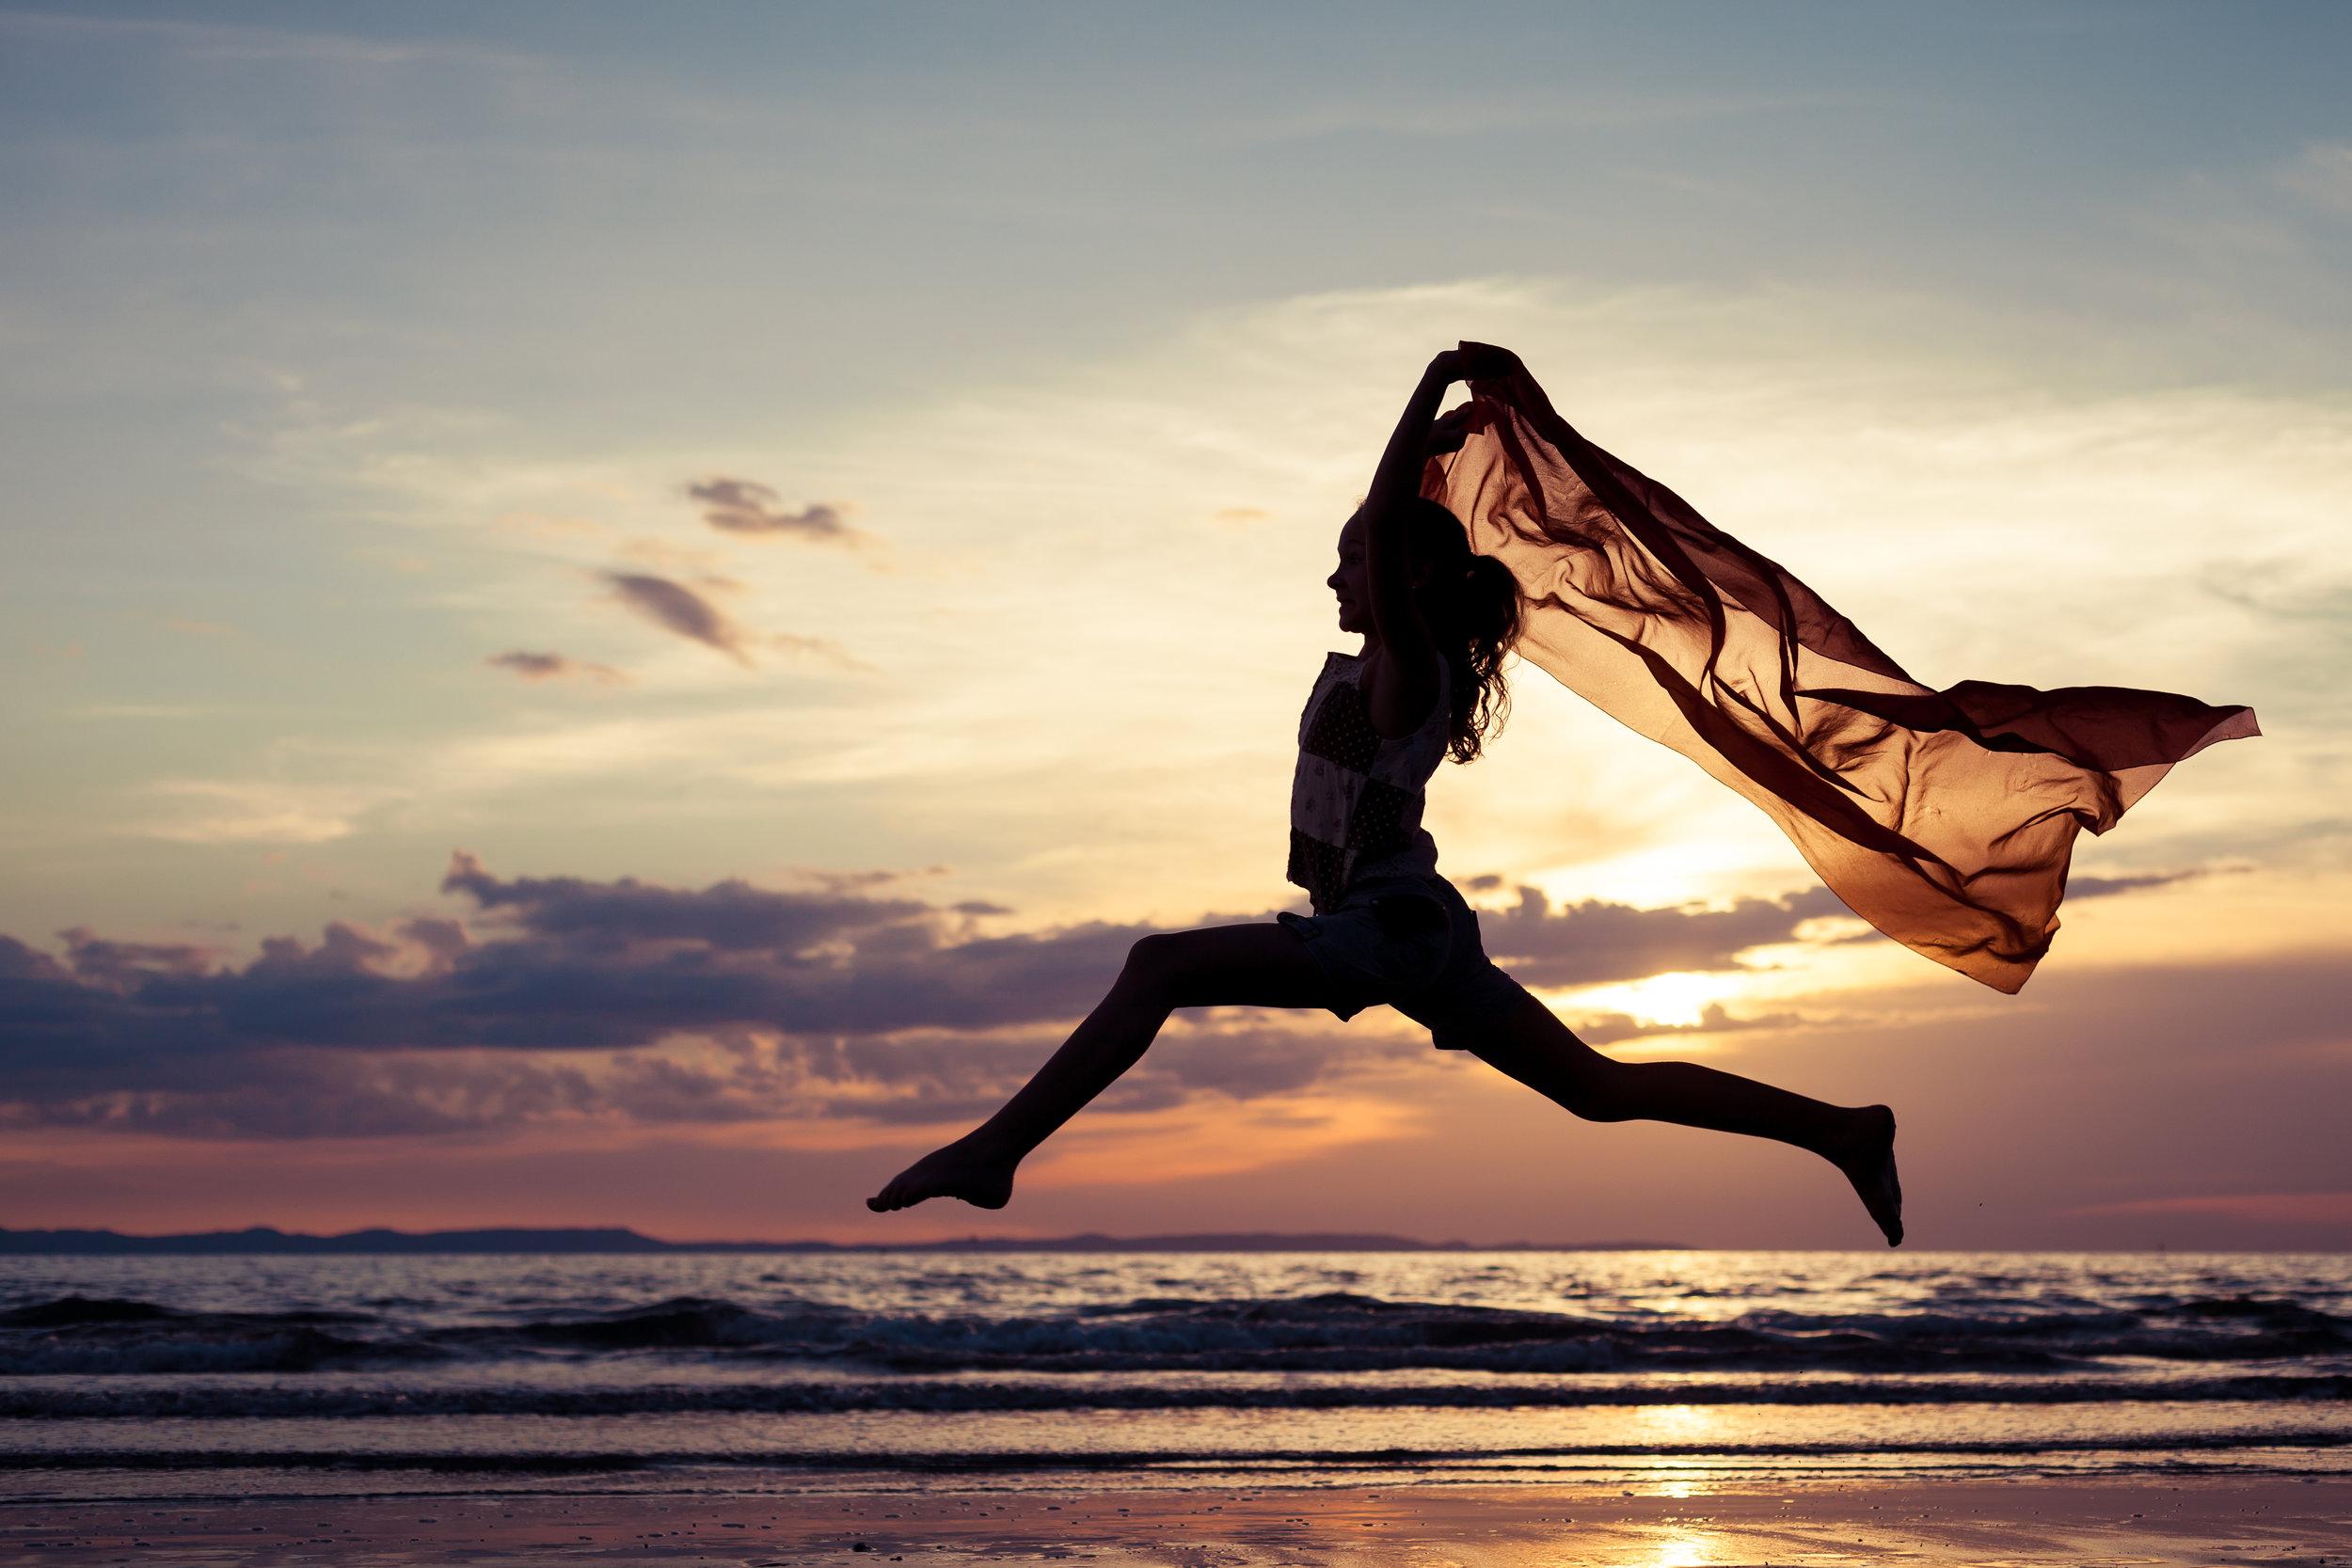 Girl Jumping Ocean.jpg